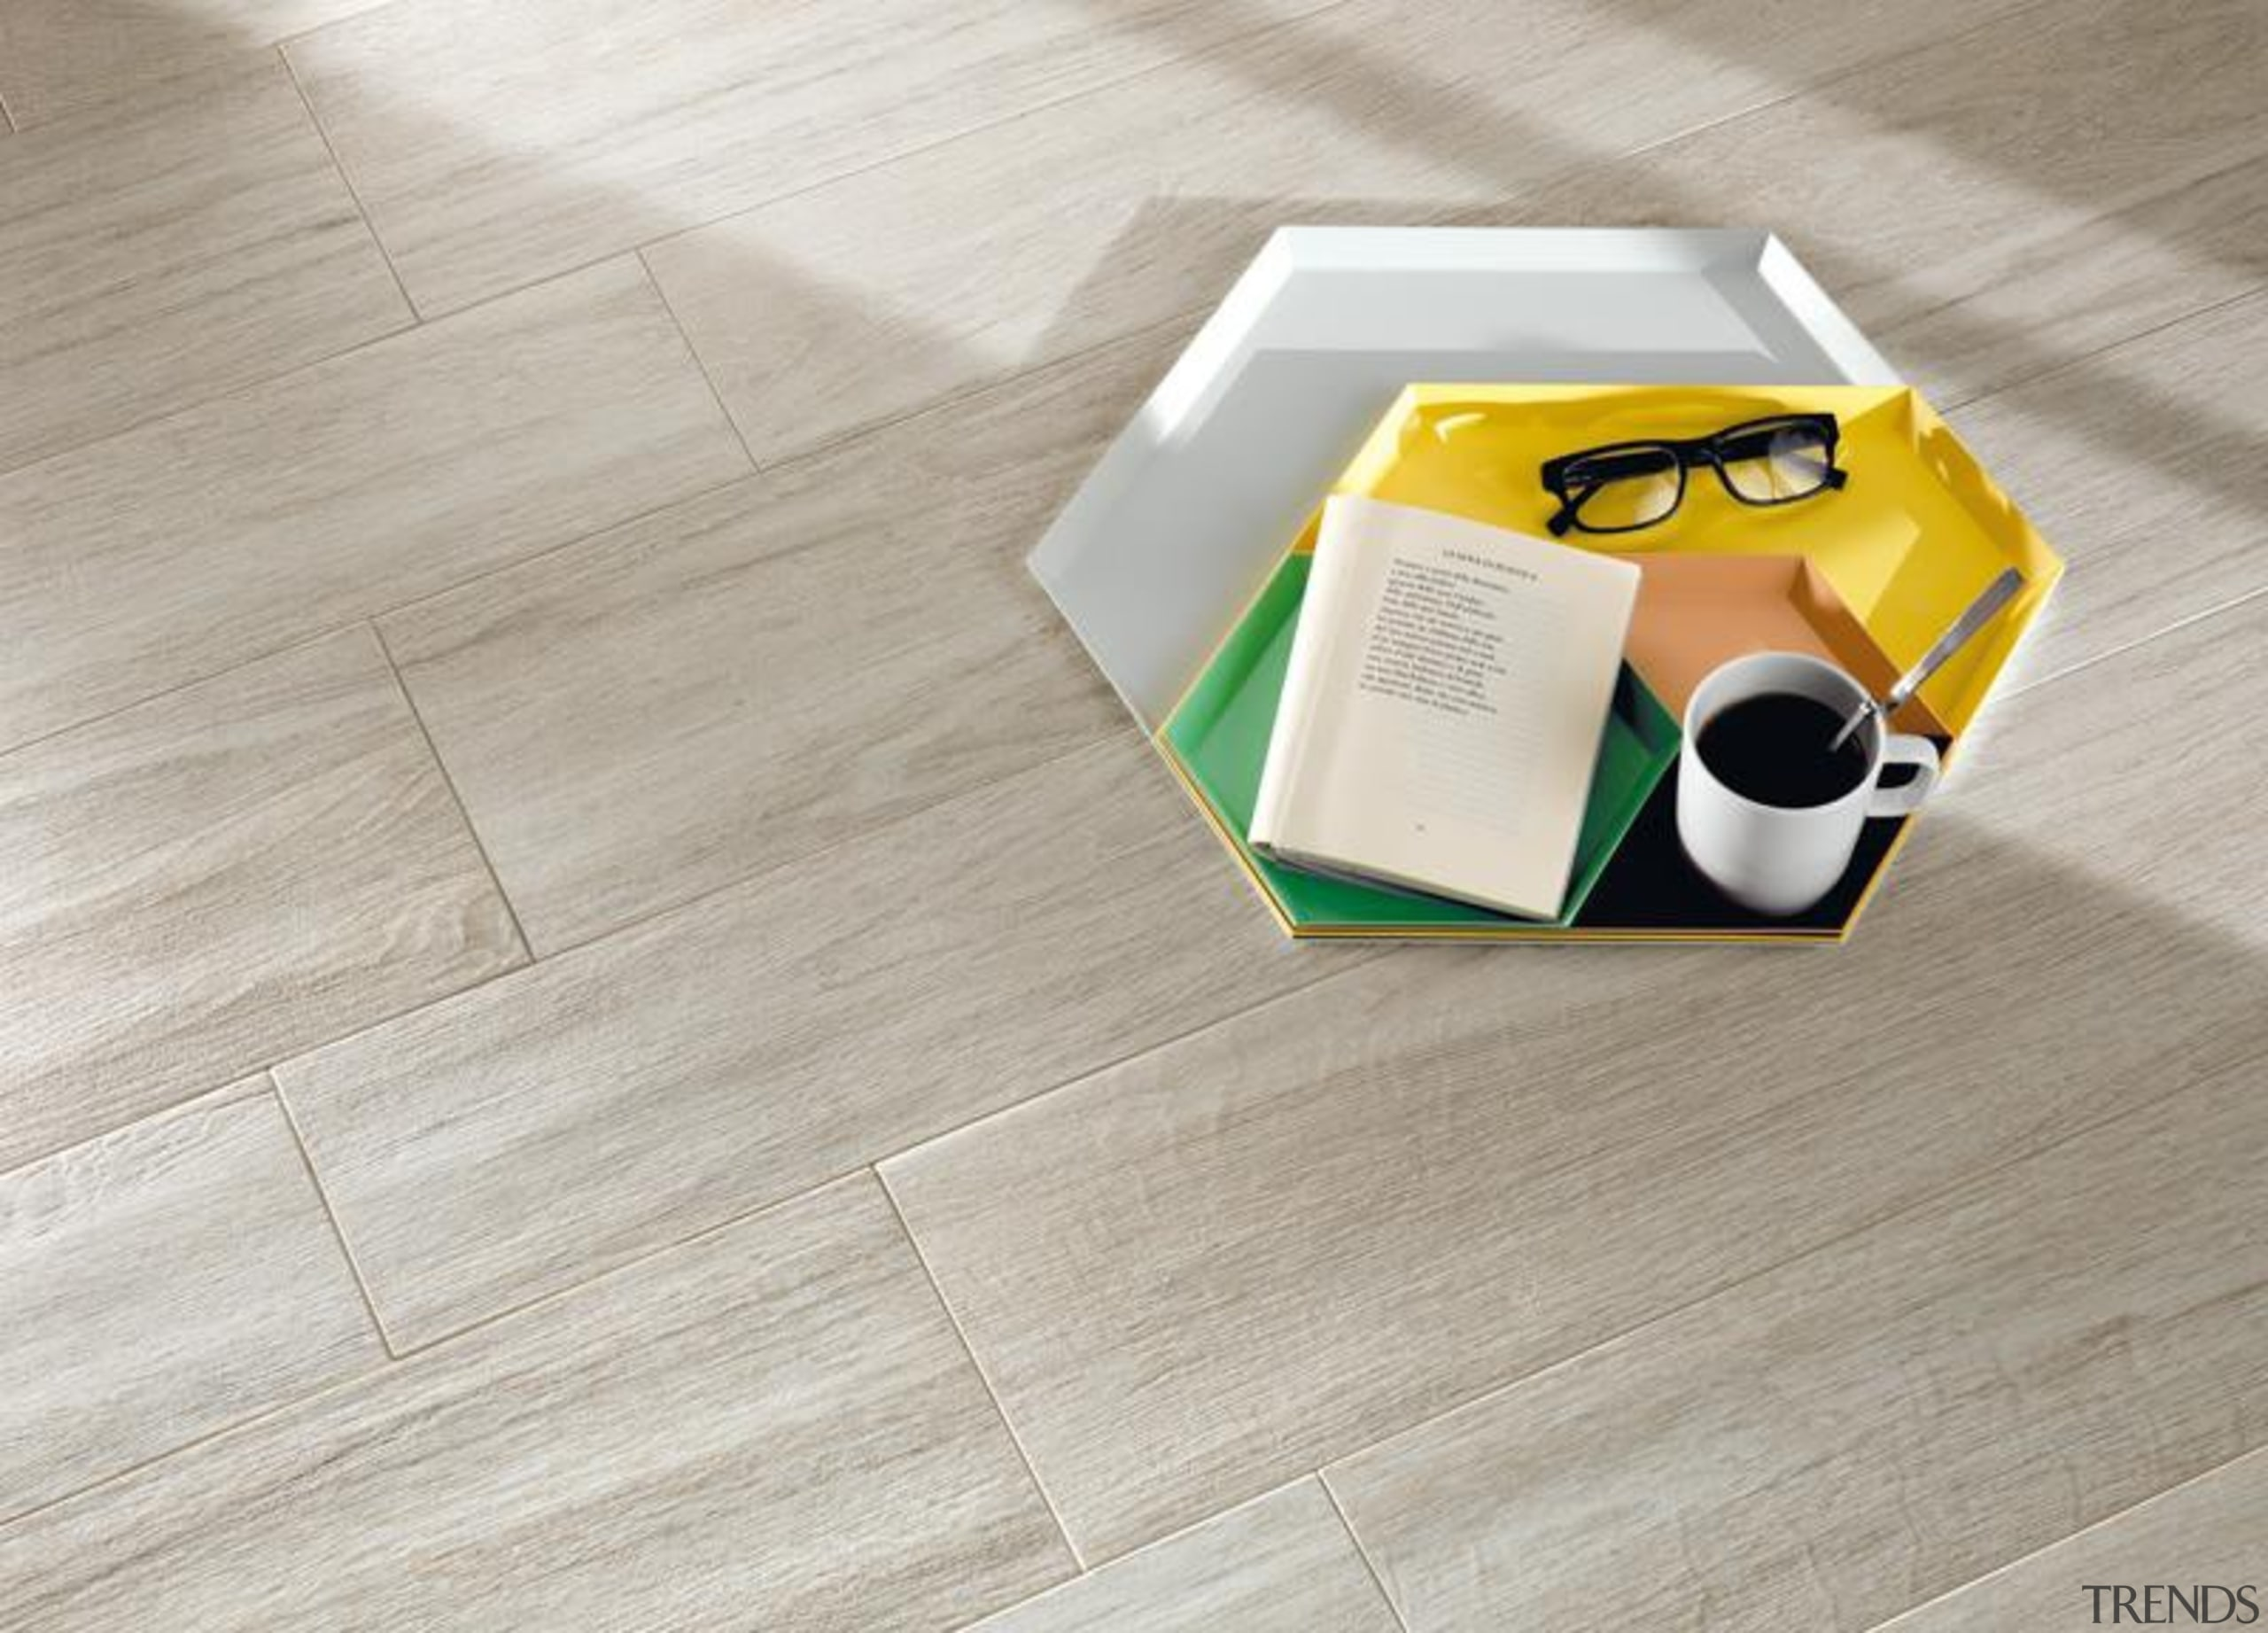 Bioplank oak ice interior anti-bacterial floor tiles. floor, flooring, hardwood, product design, table, tile, wood, wood flooring, yellow, gray